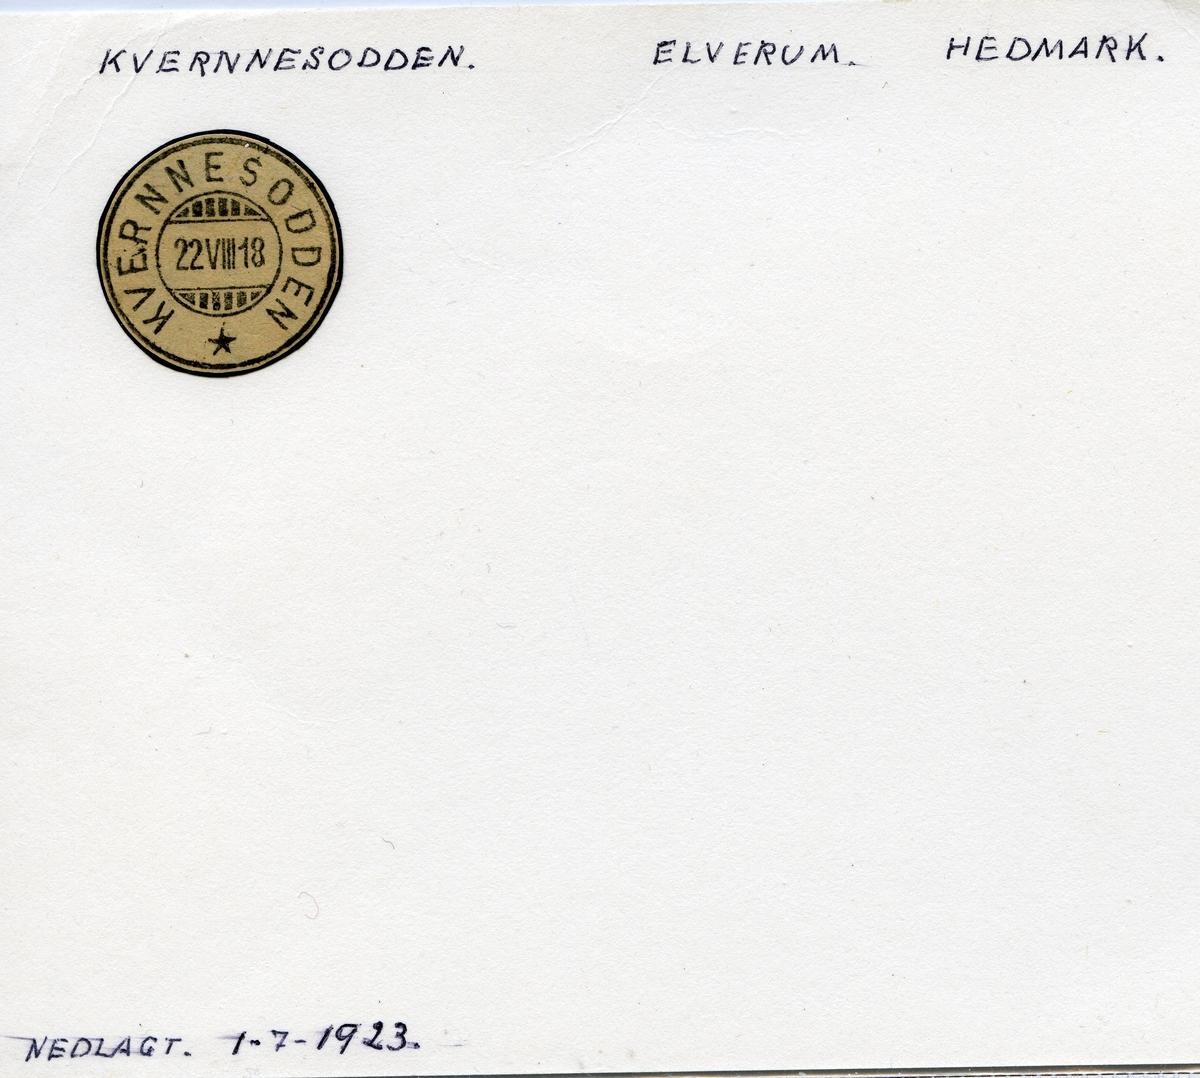 Stempelkatalog Kvernnesodden, Elverum, Hedmark